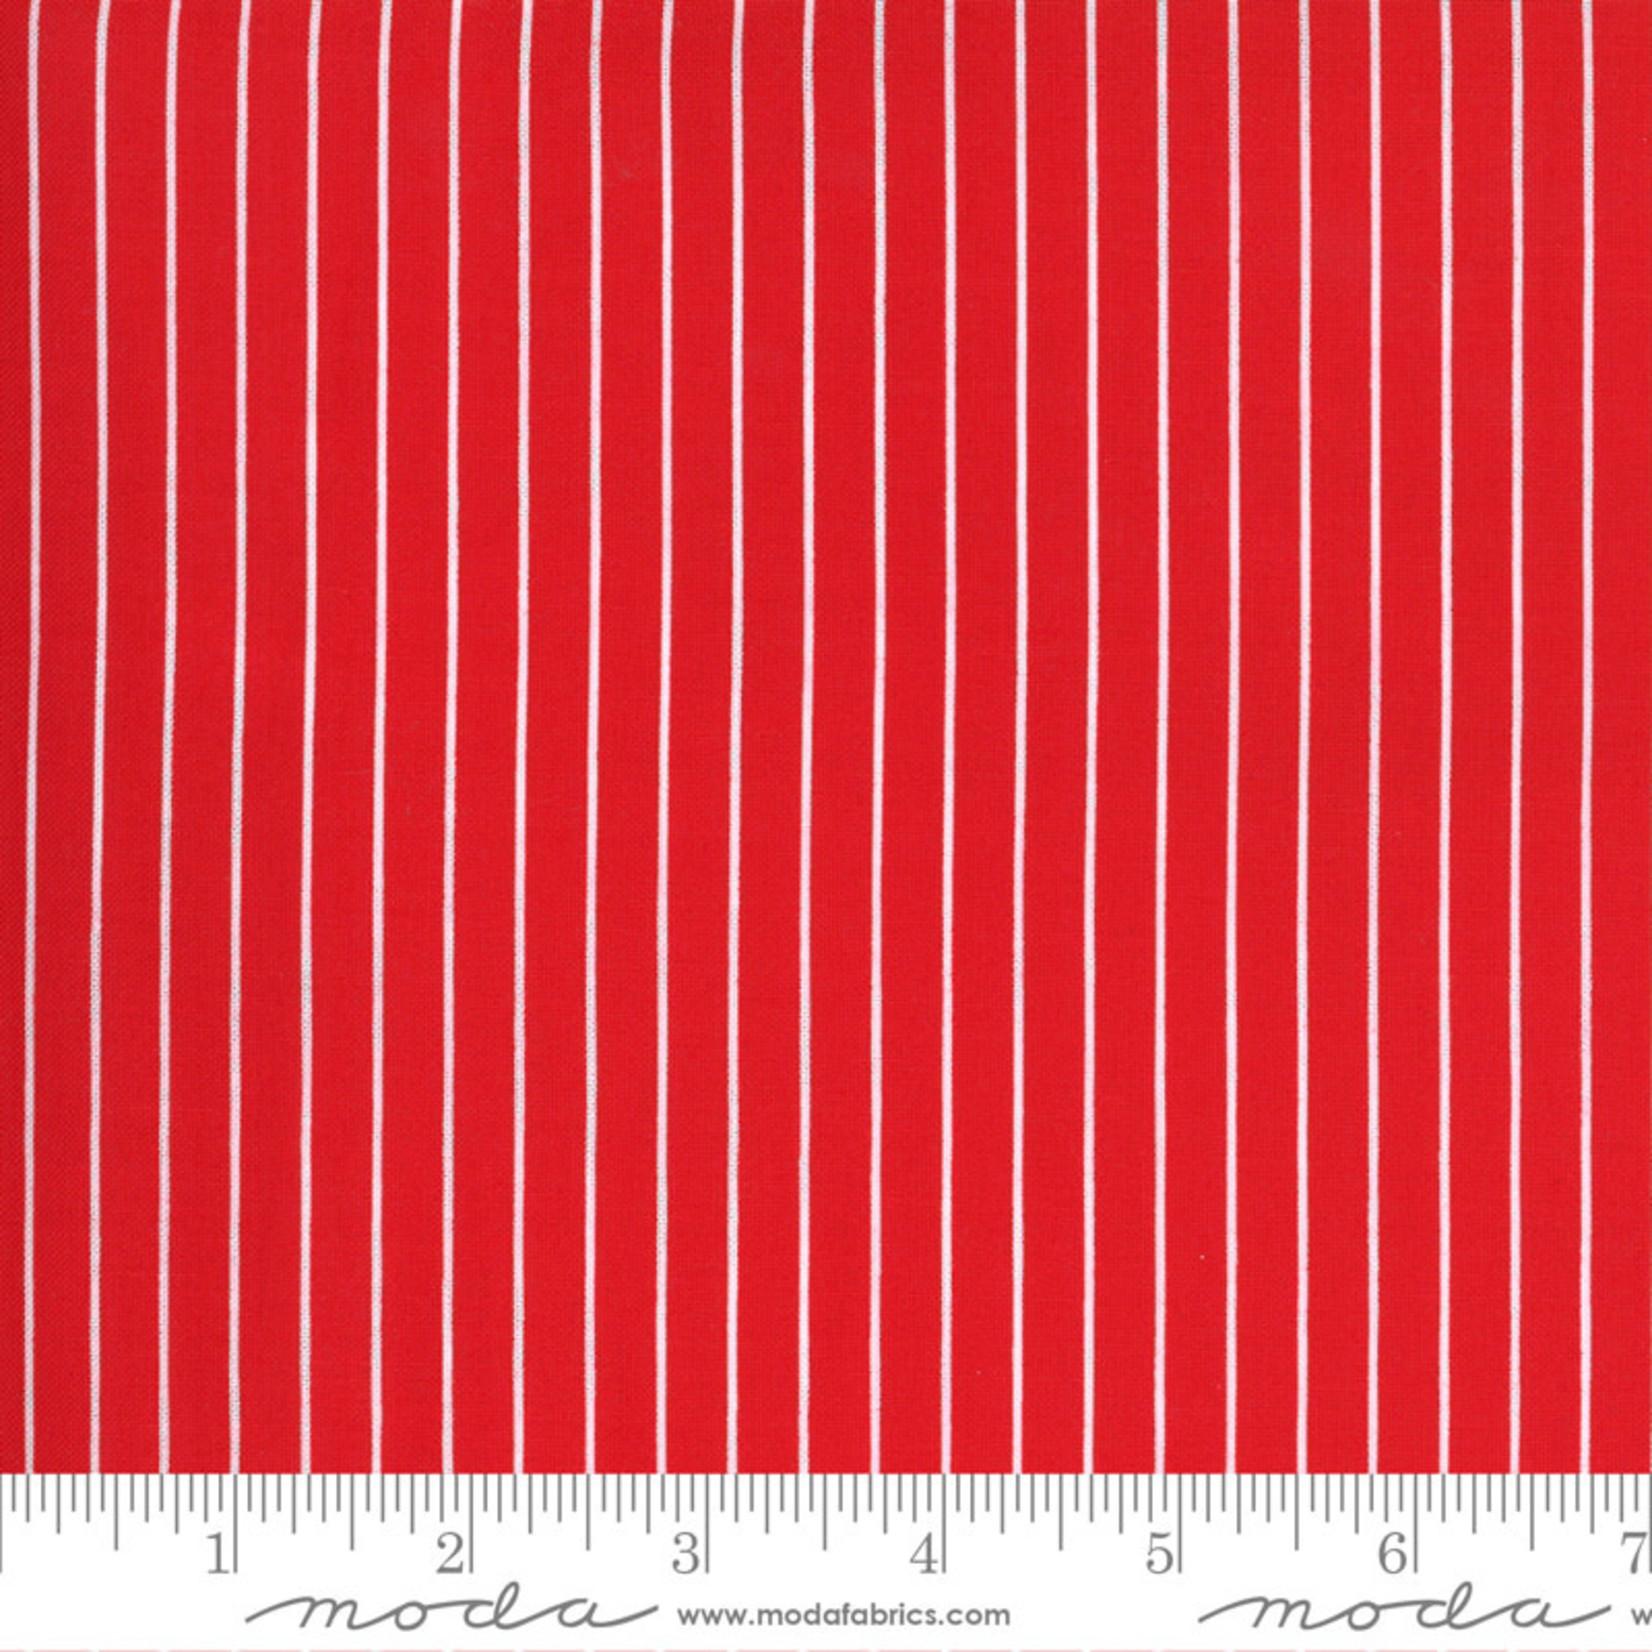 Bonnie & Camille Sunday Stroll, Wide Stripe, Red 55228 12 $0.20 per cm or $20/m